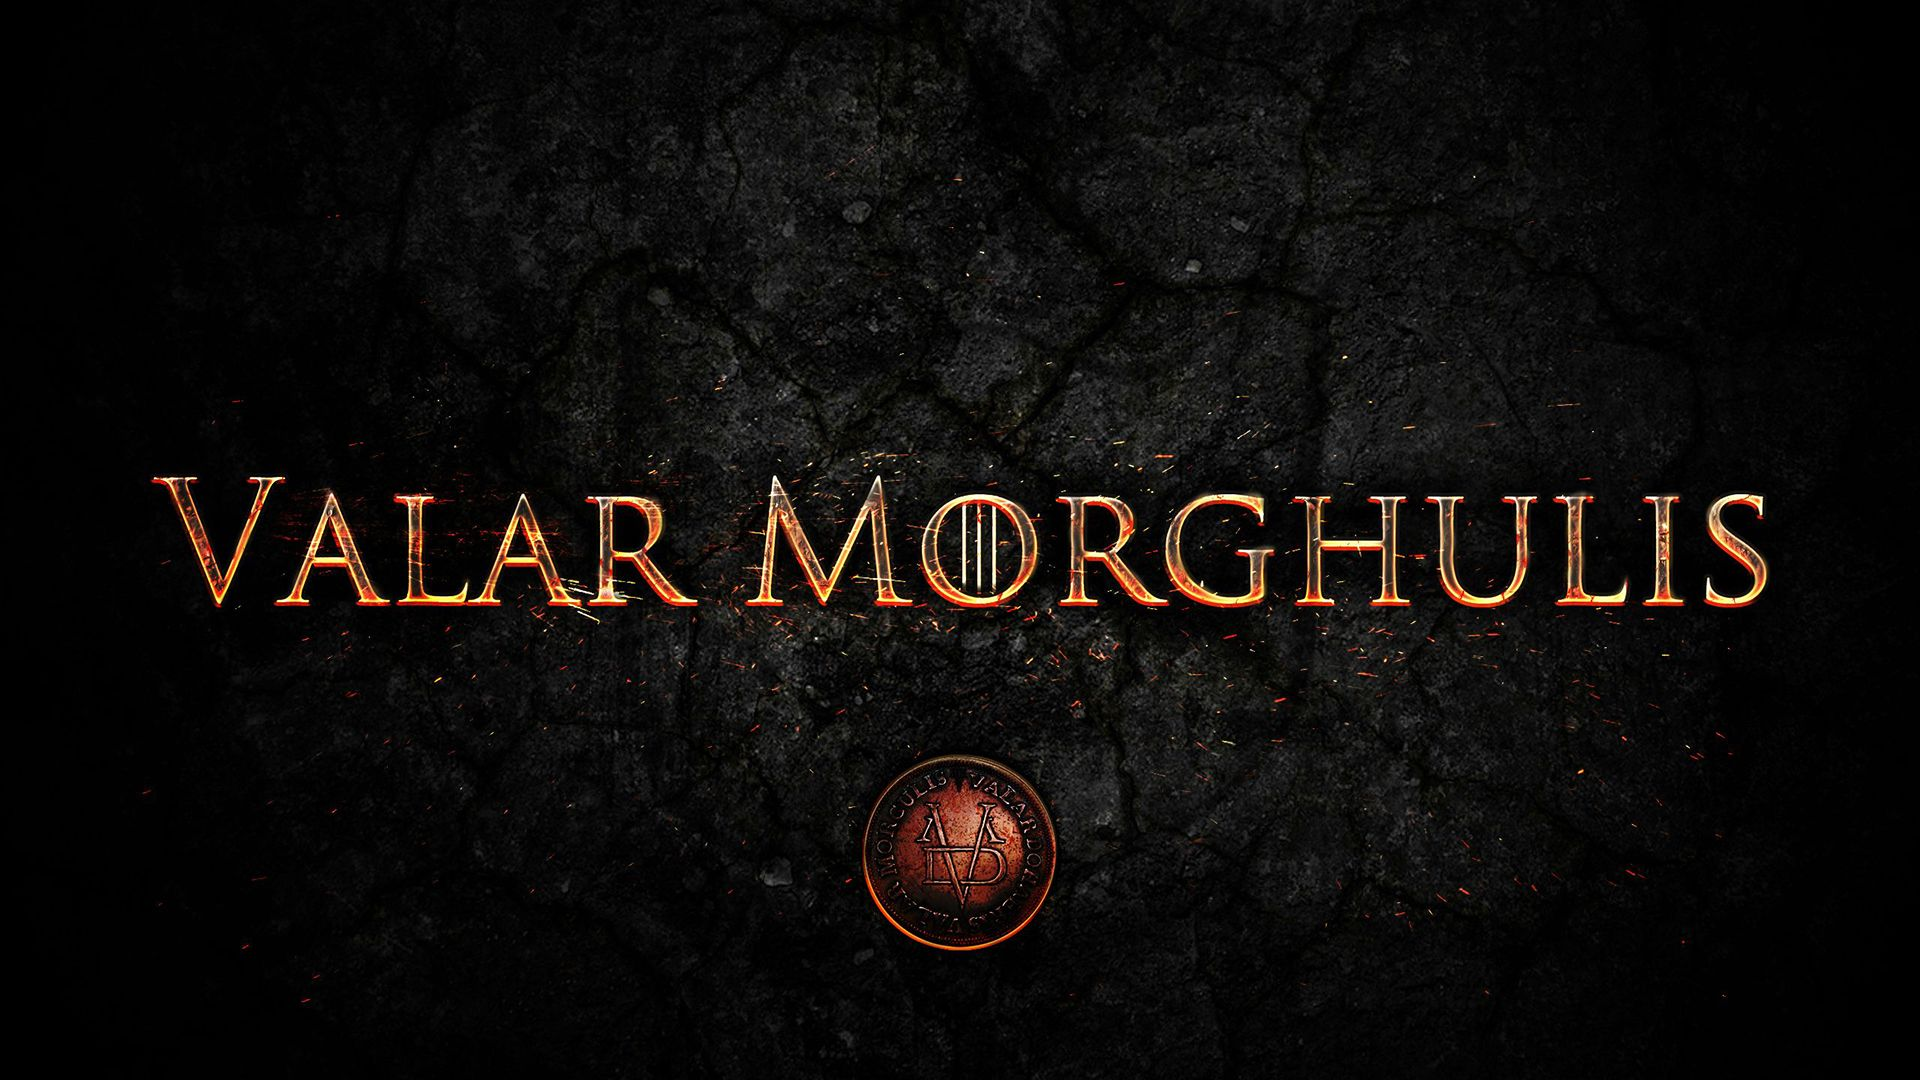 Valar Morghulis Game Of Thrones Wallpaper Hd Movie Wallpapers